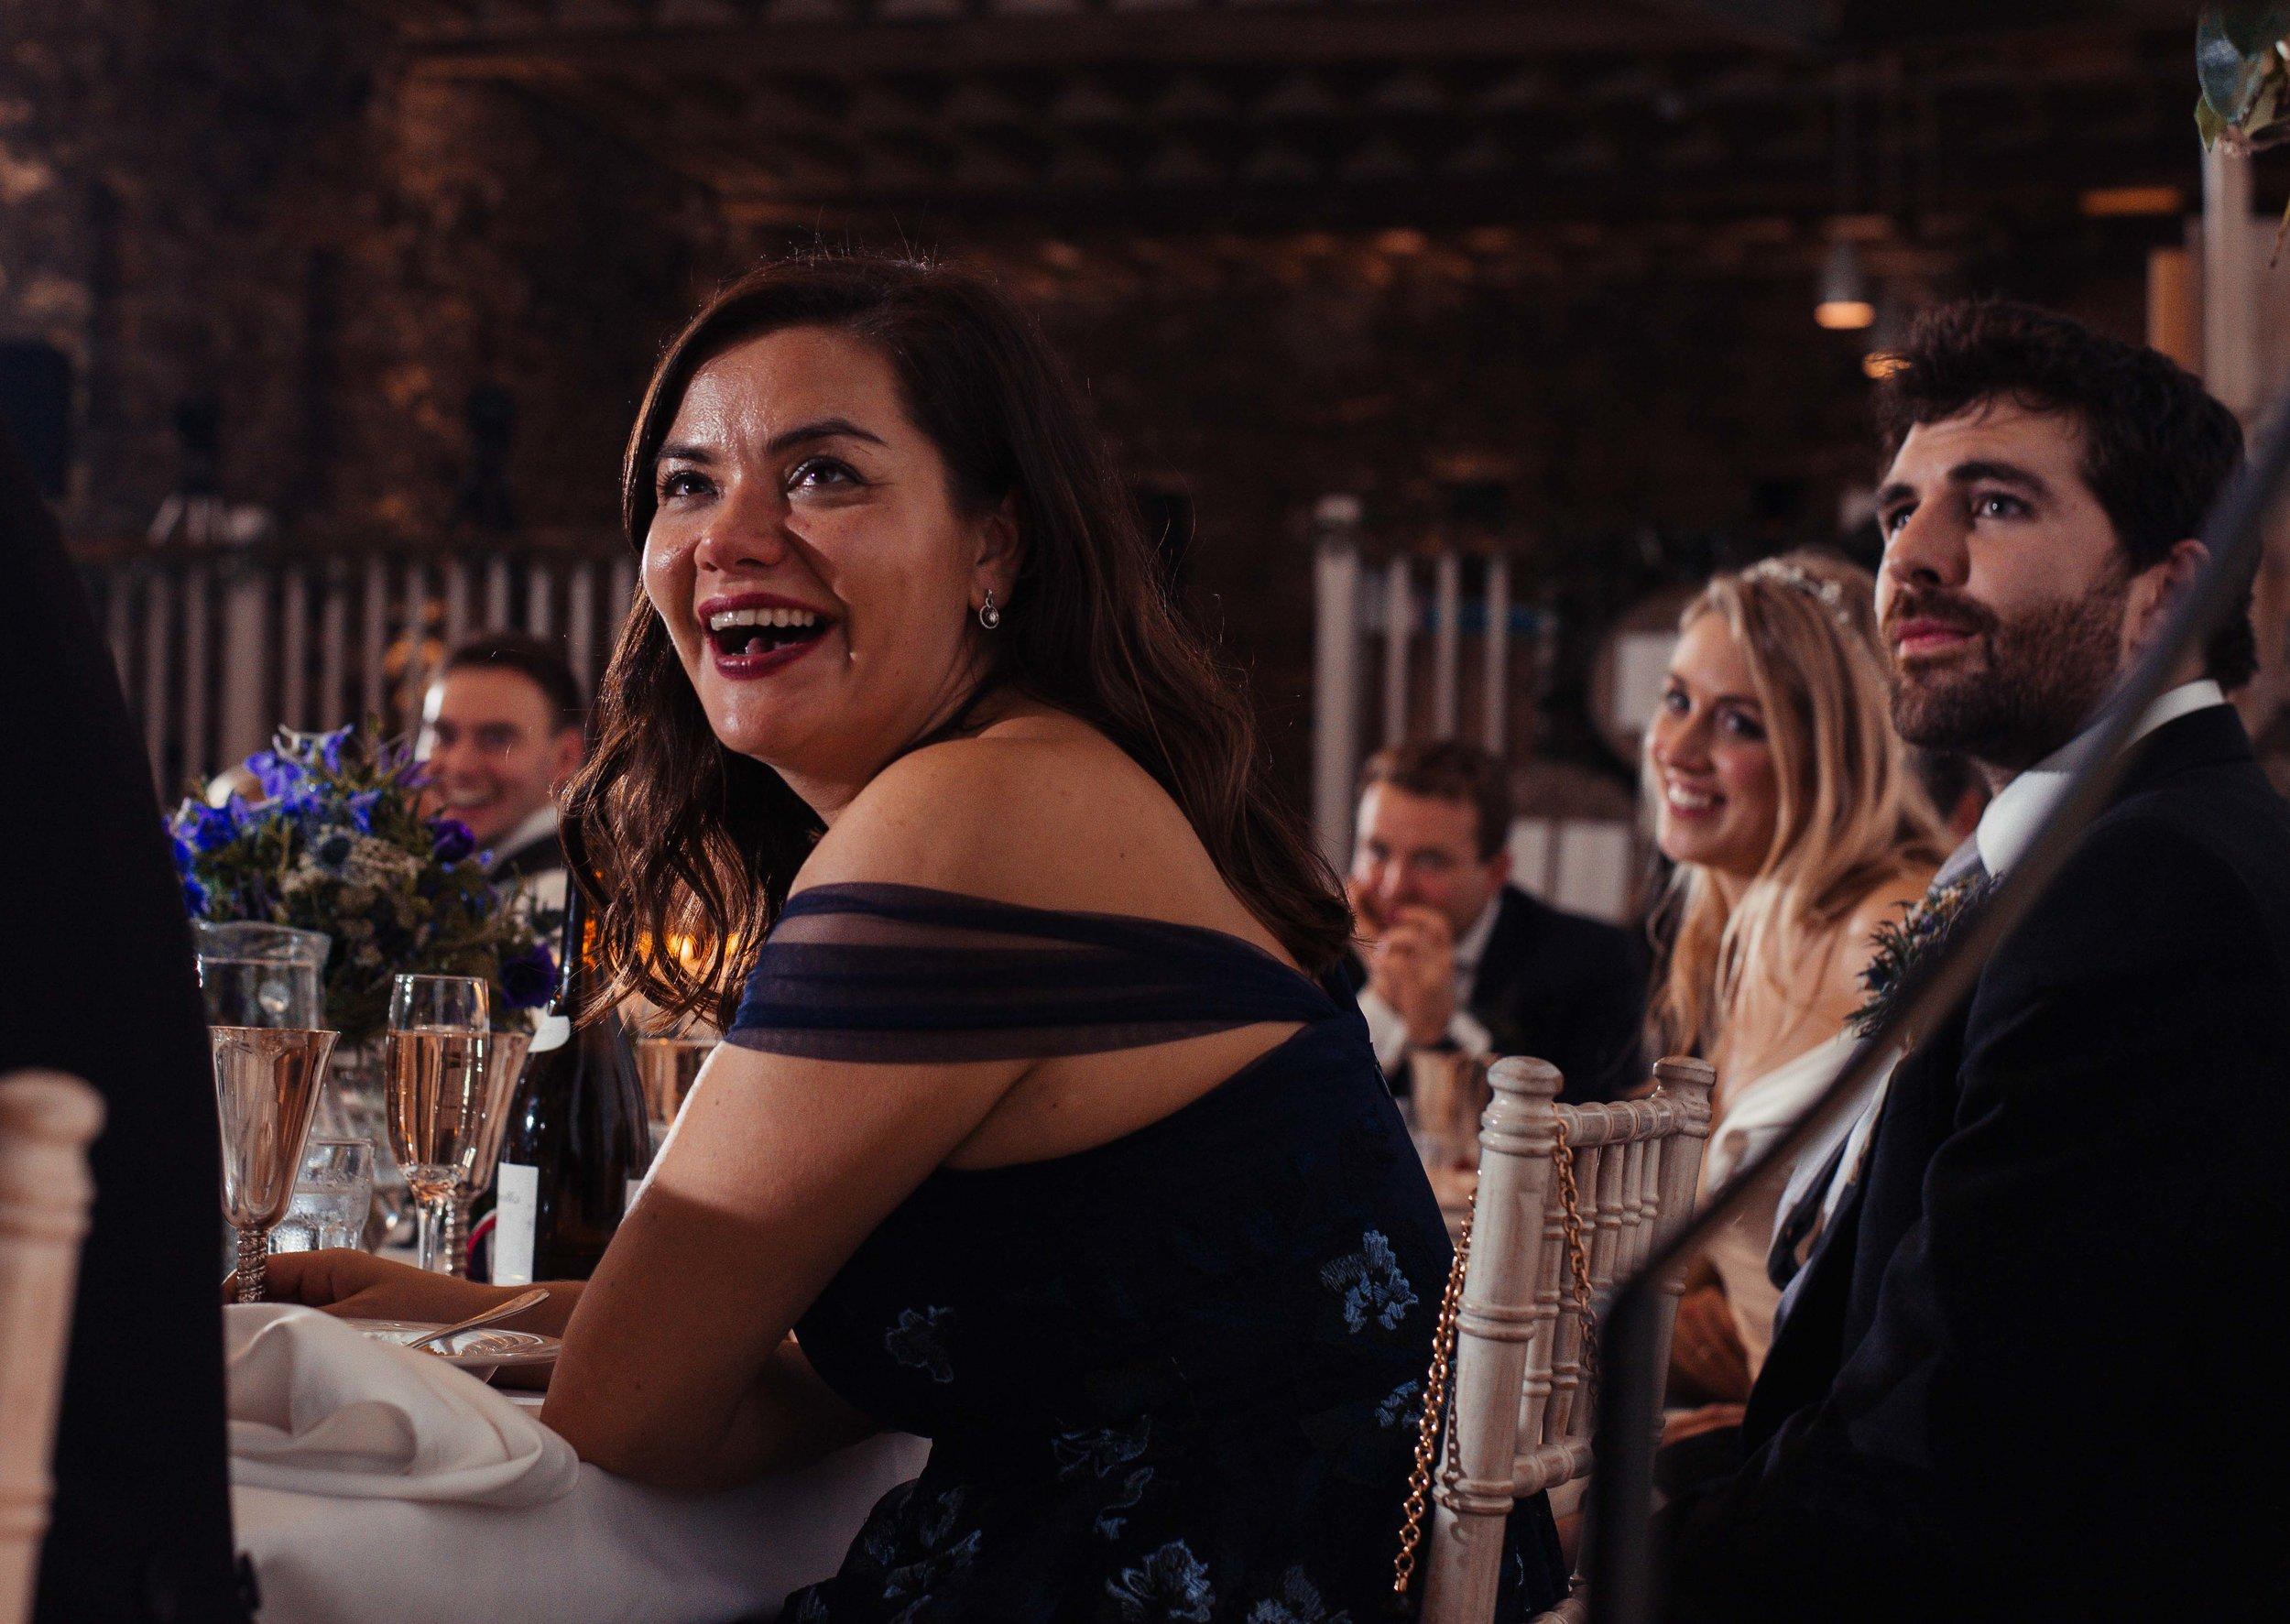 Askham-Hall-Wedding-Photography-81.jpg